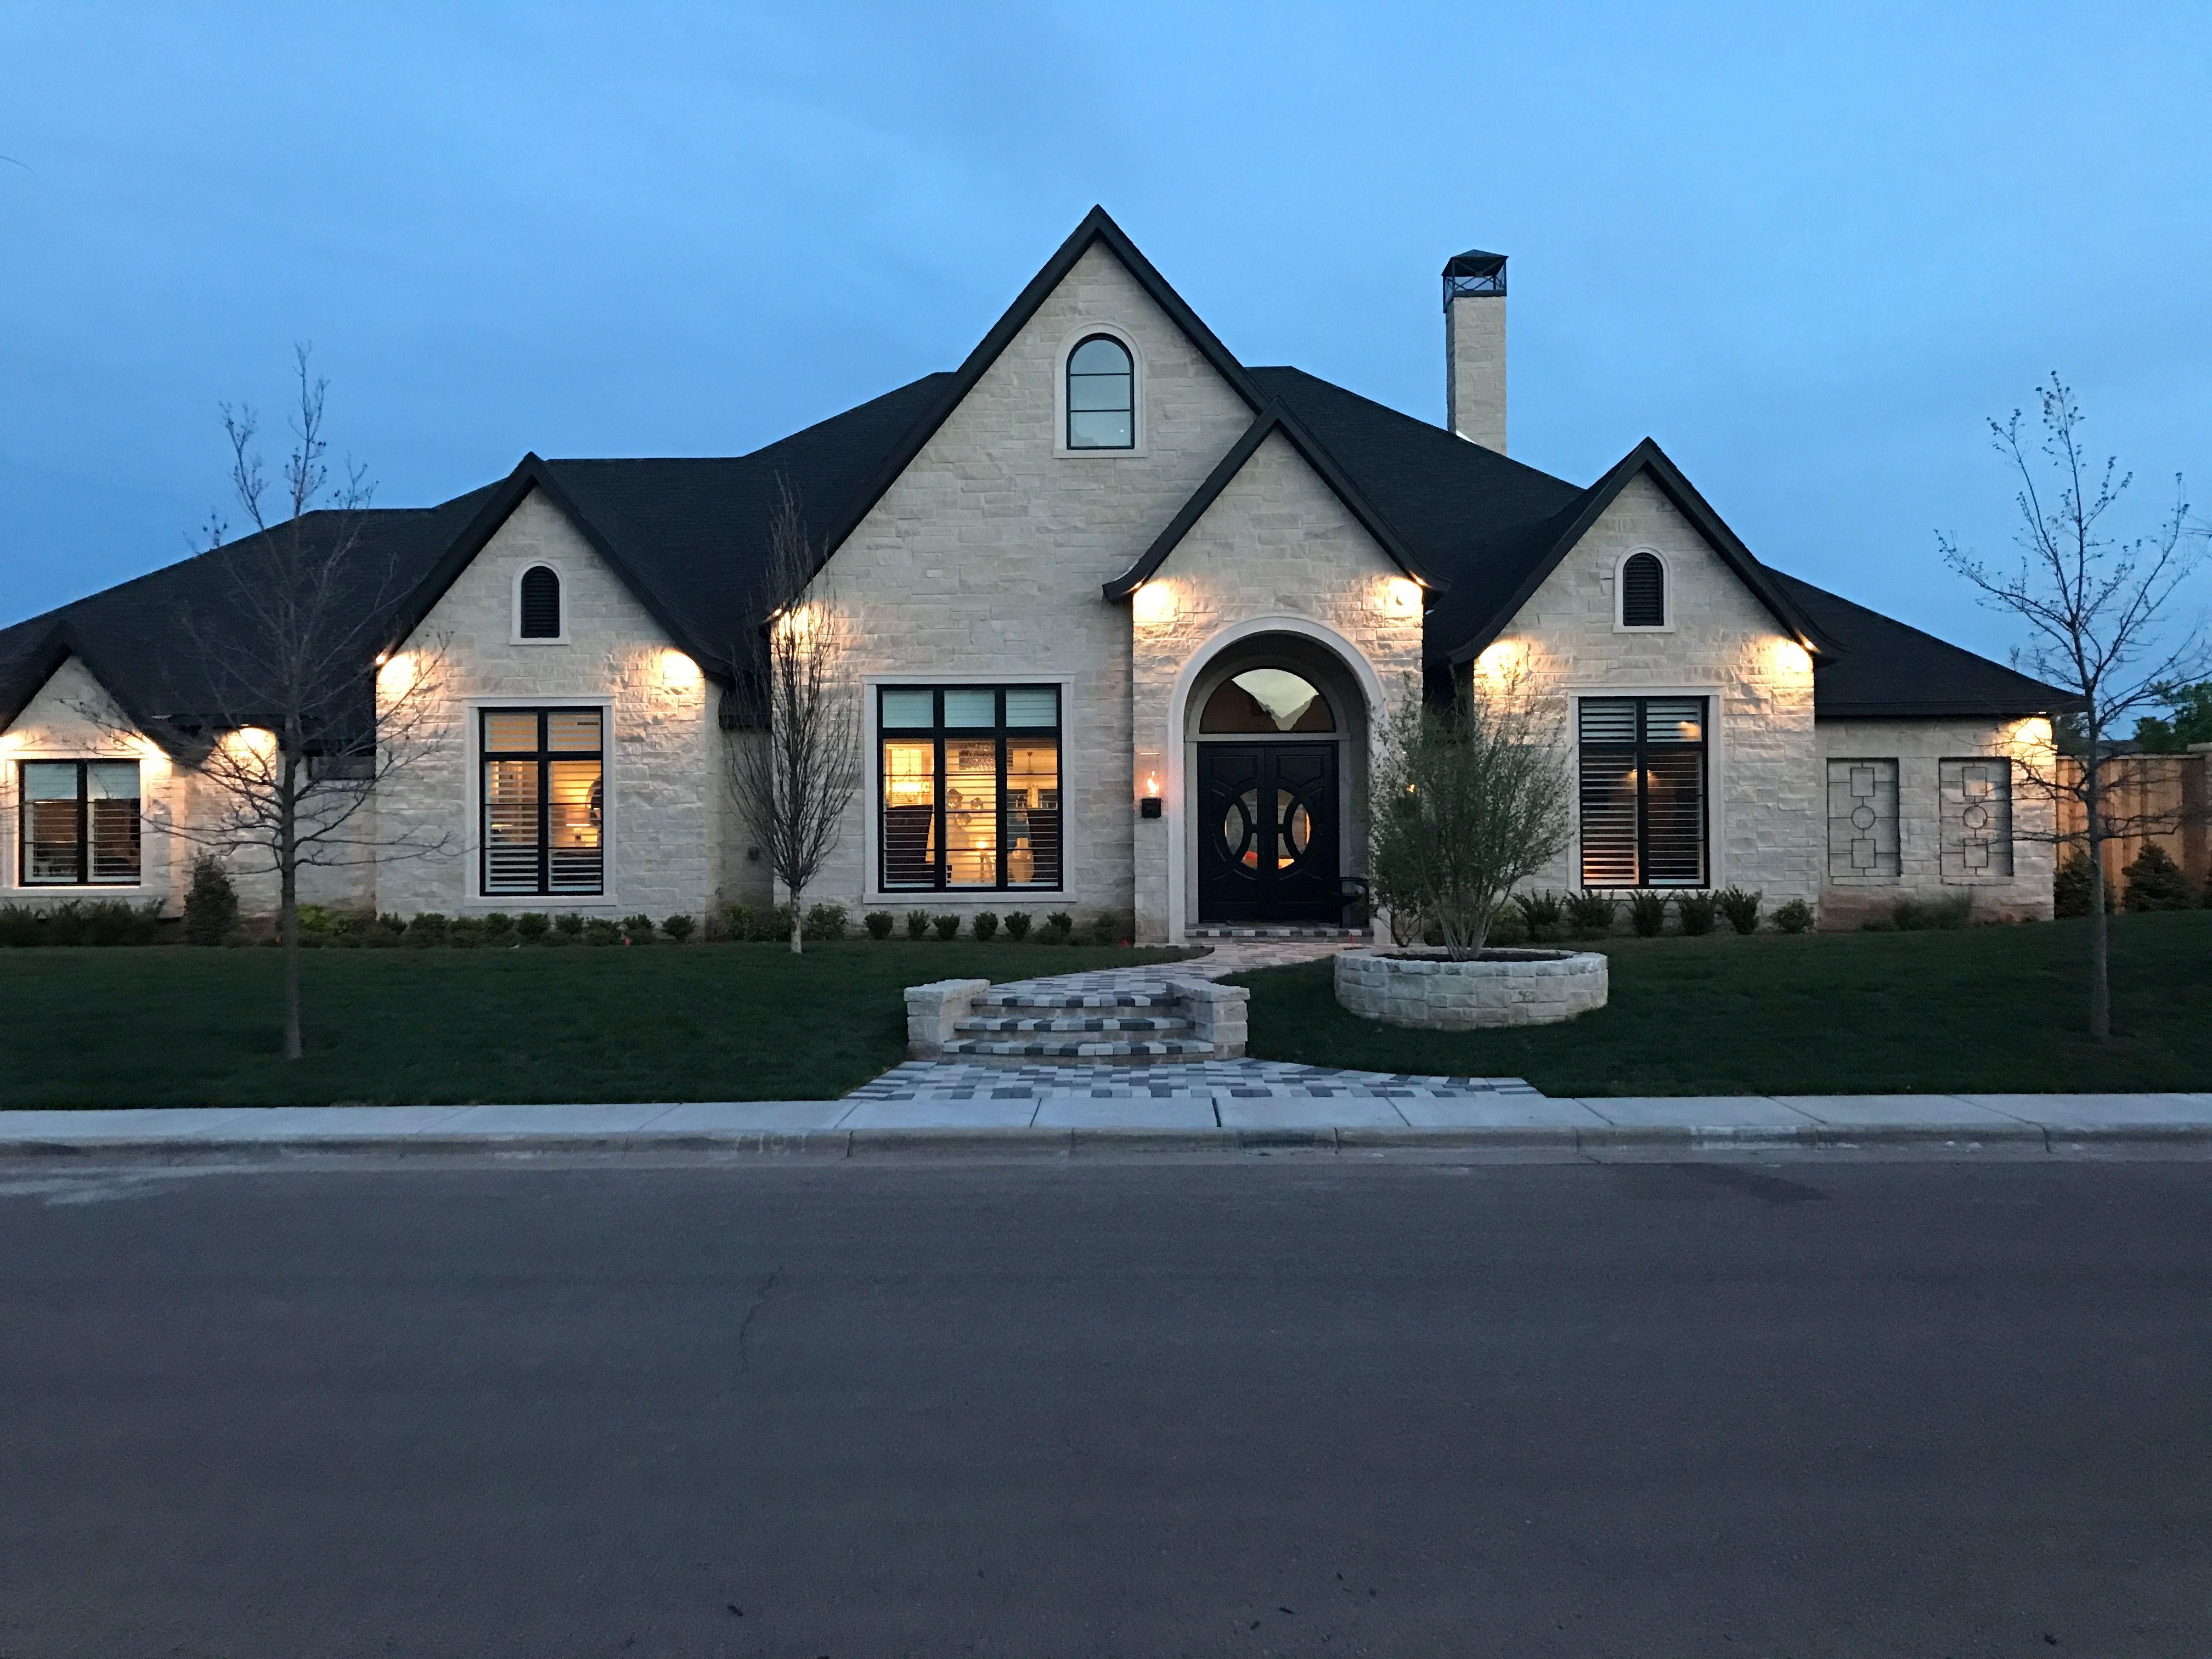 White Stone With Black Trim Brick Exterior House Stone Exterior Houses Dream House Exterior